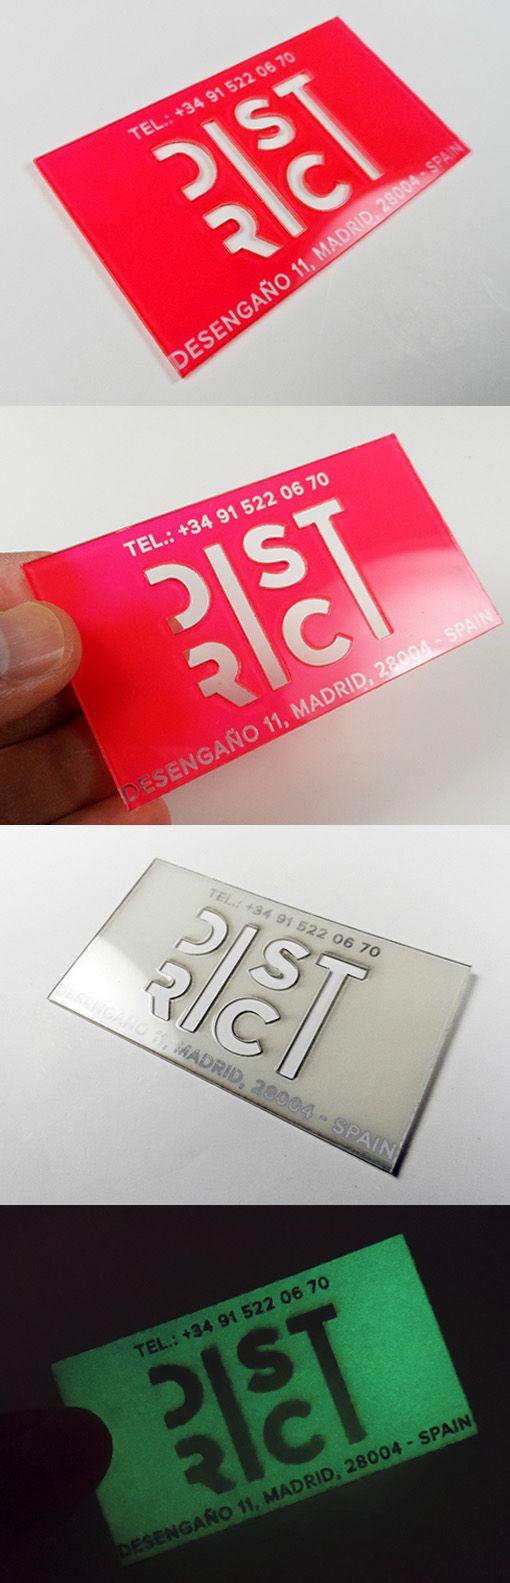 Amazing Glow In The Dark Laser Cut Plastic Business Card Design